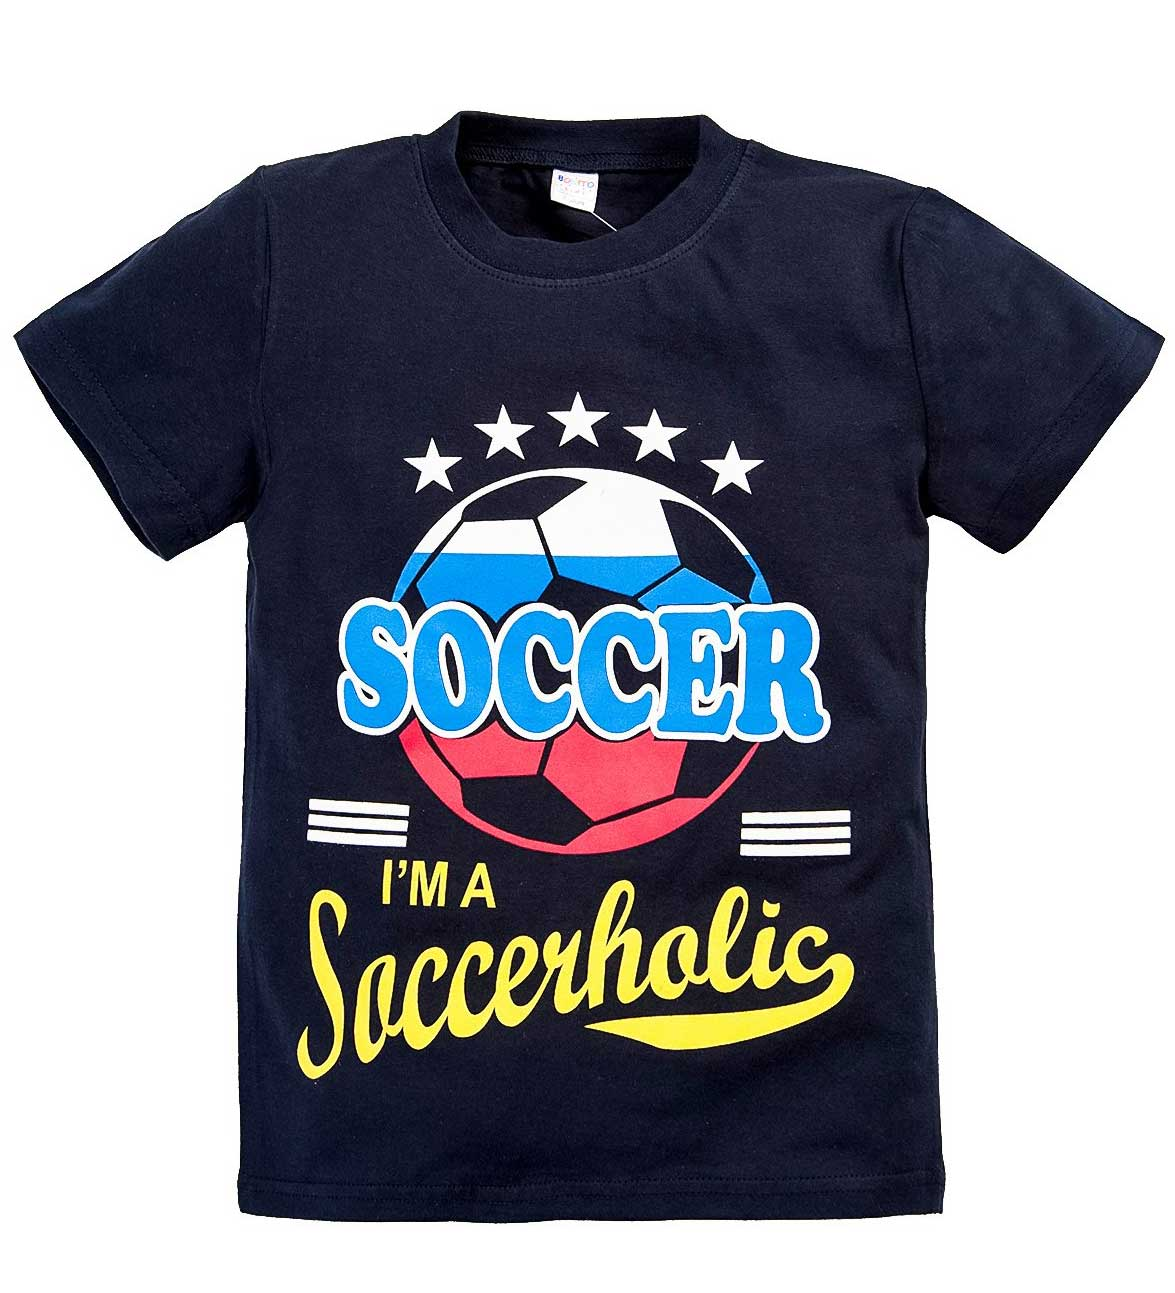 Футболка для мальчика 8-12 лет BJ003F6